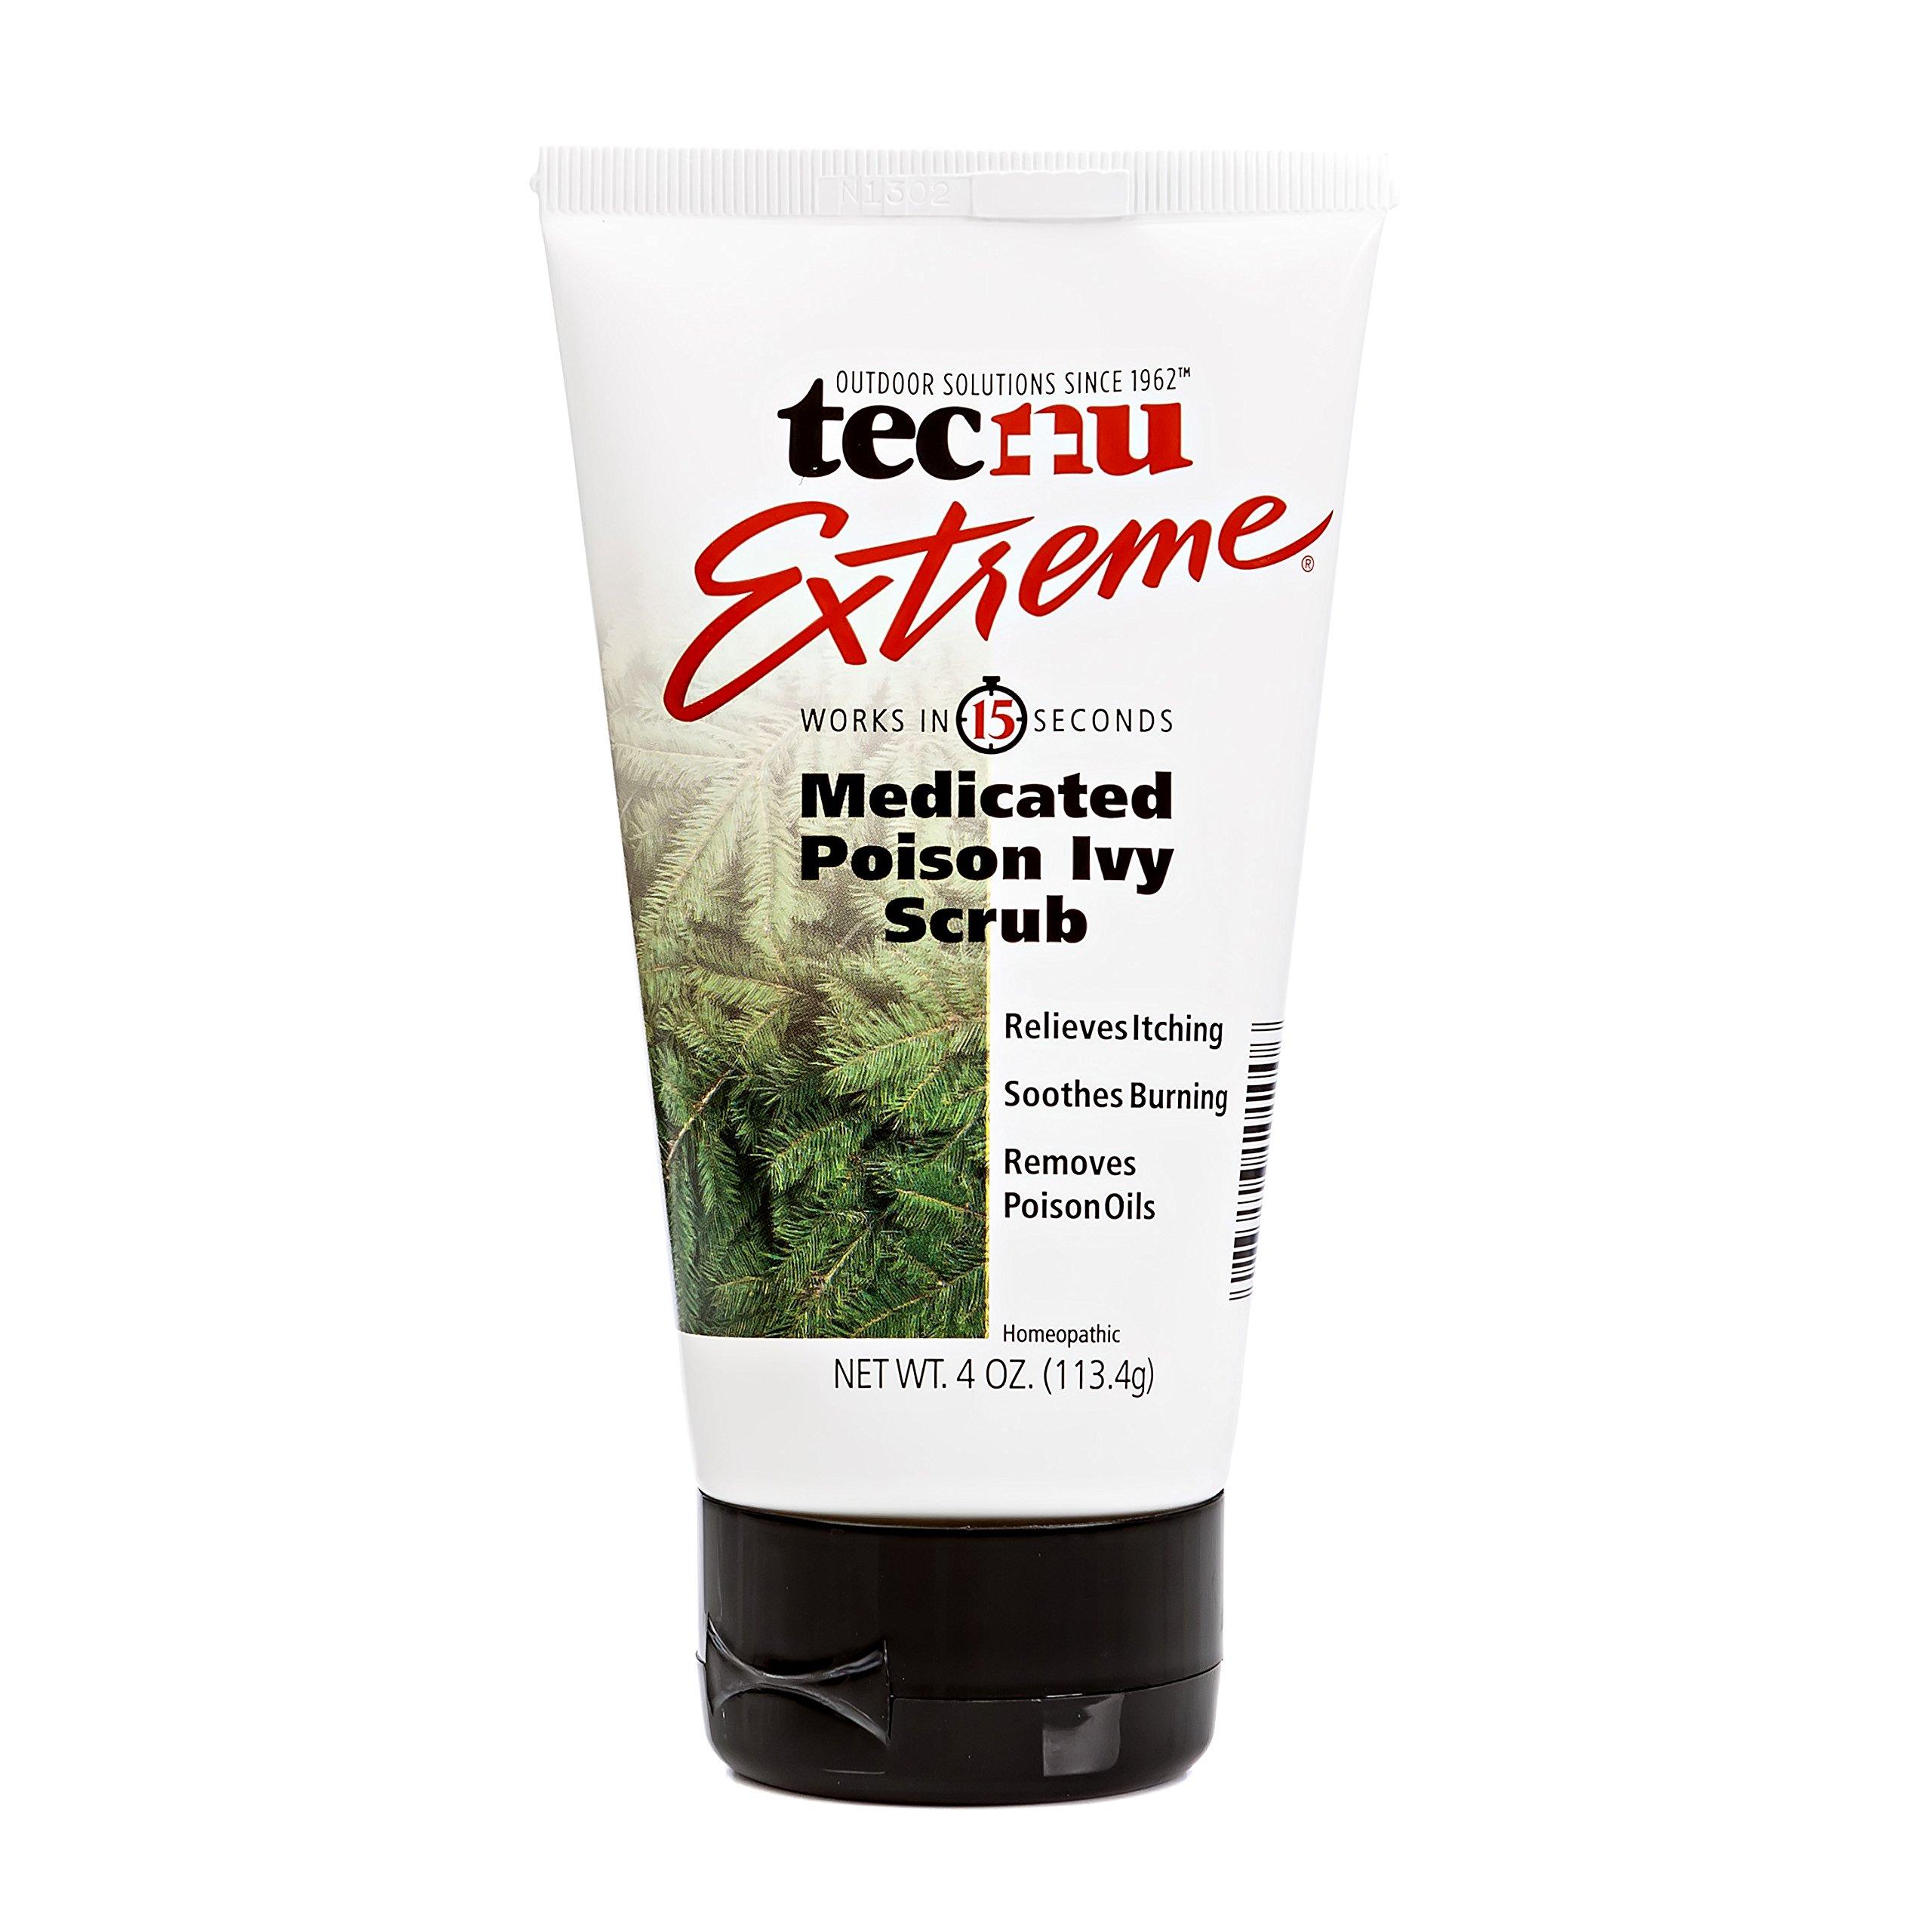 TECNU Extreme Medicated Poison Ivy Scrub